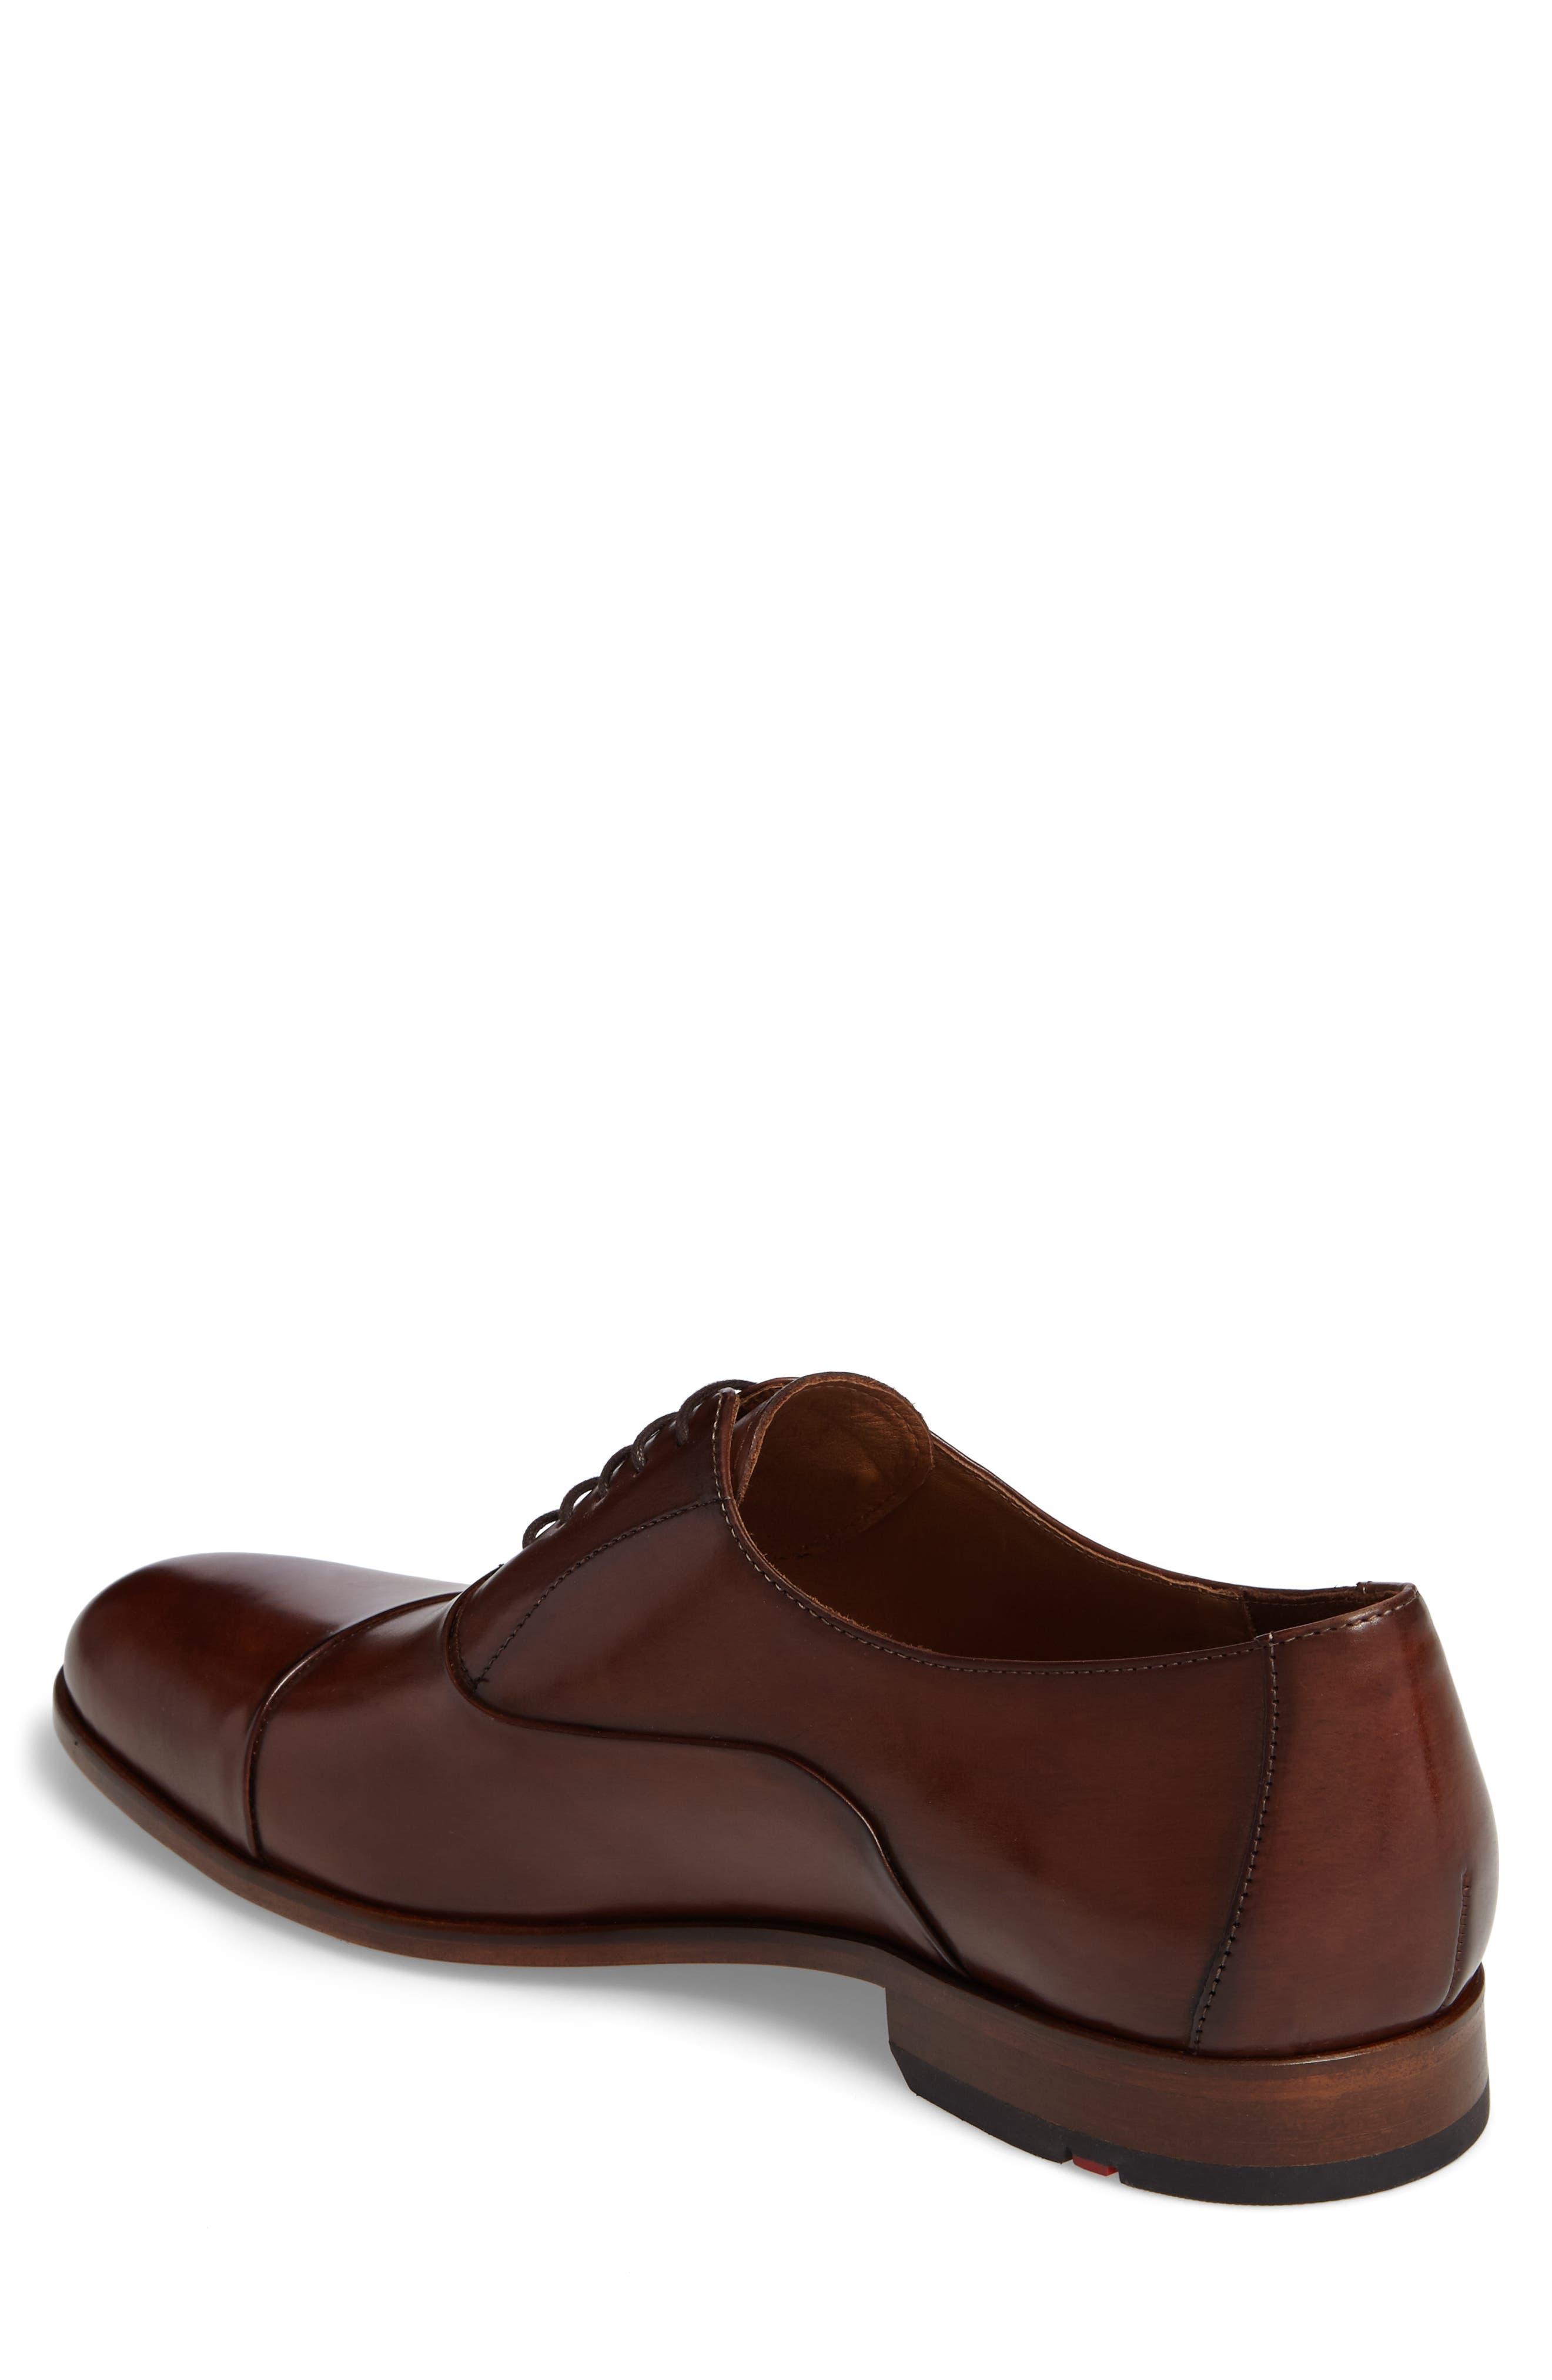 Malik Cap-Toe Oxford,                             Alternate thumbnail 2, color,                             Brown Leather